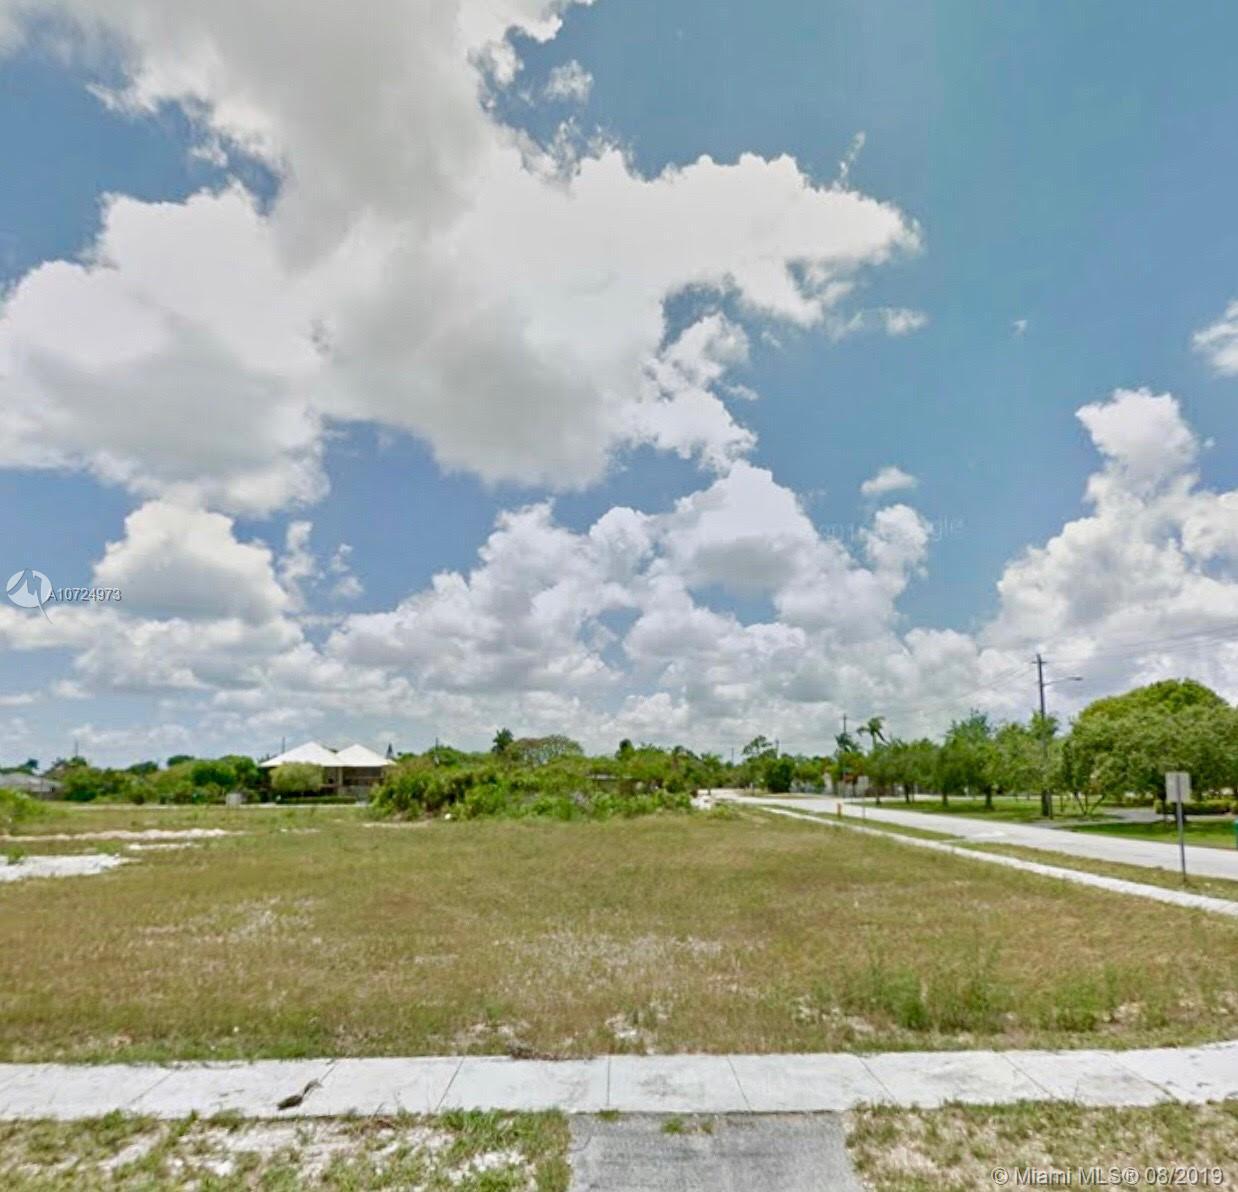 17380 299th St, Homestead, FL 33030 - Homestead, FL real estate listing